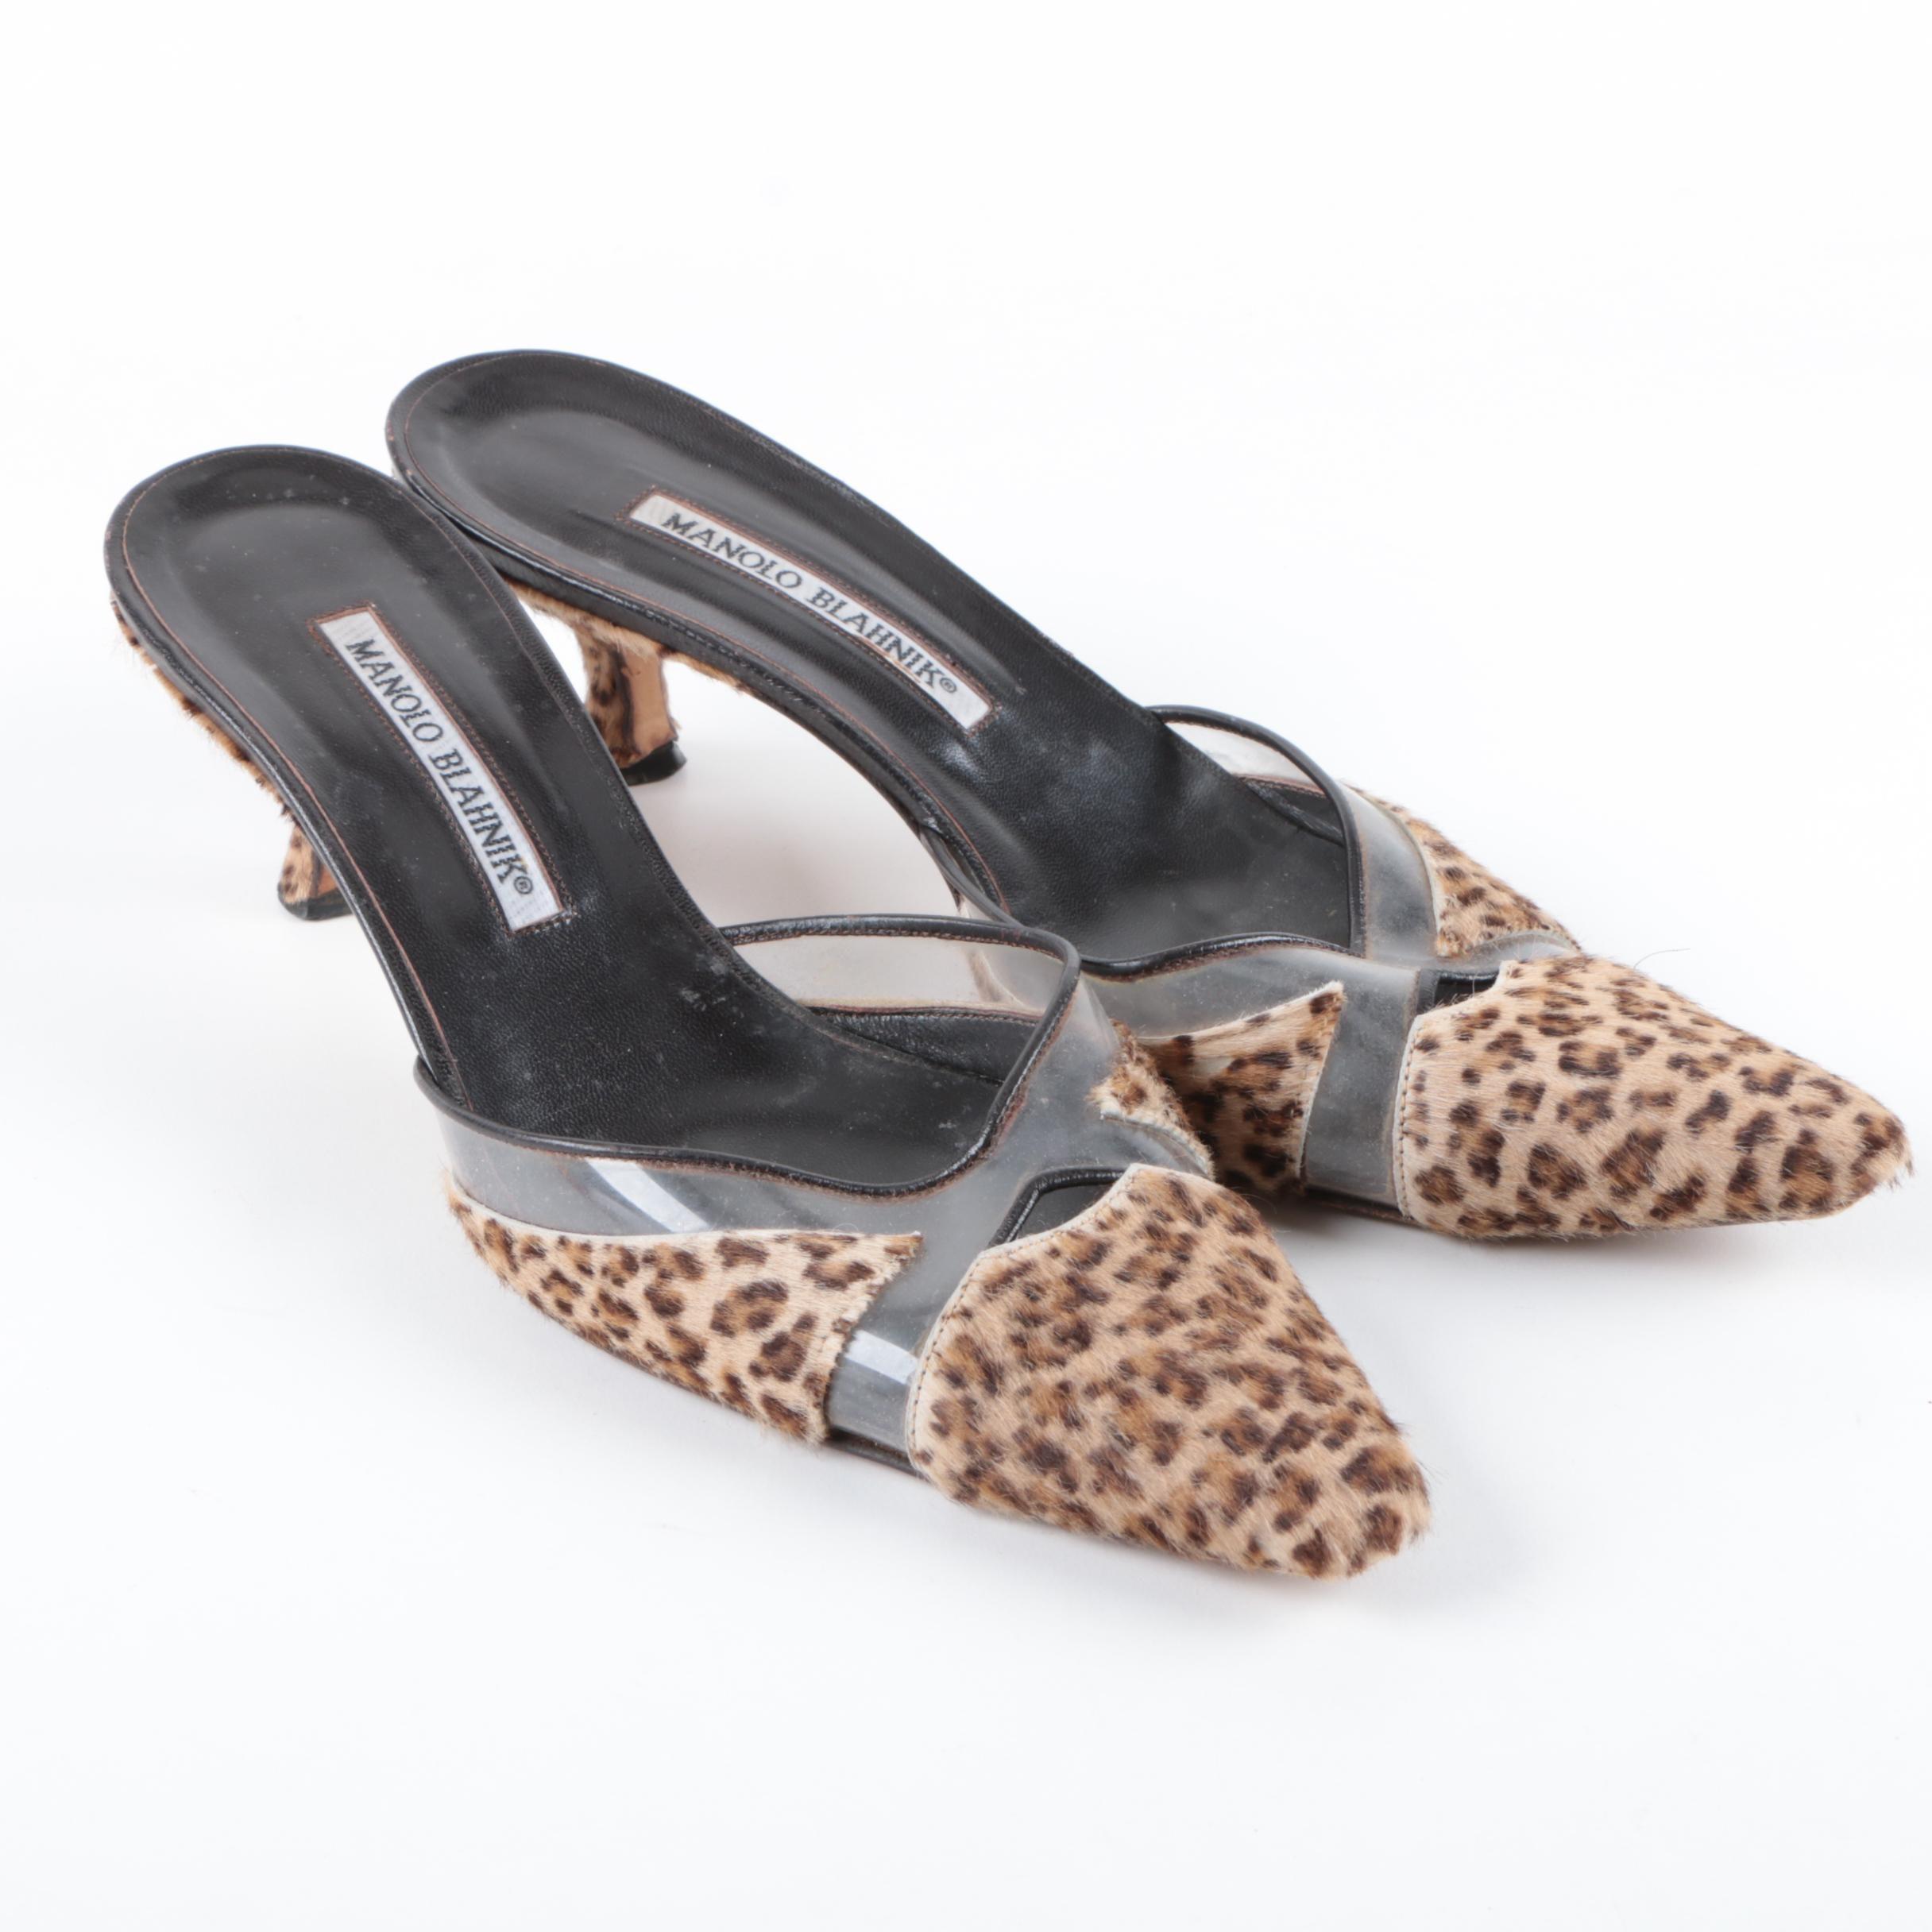 Manolo Blahnik Cheetah Print Calf Fur Kitten Heels